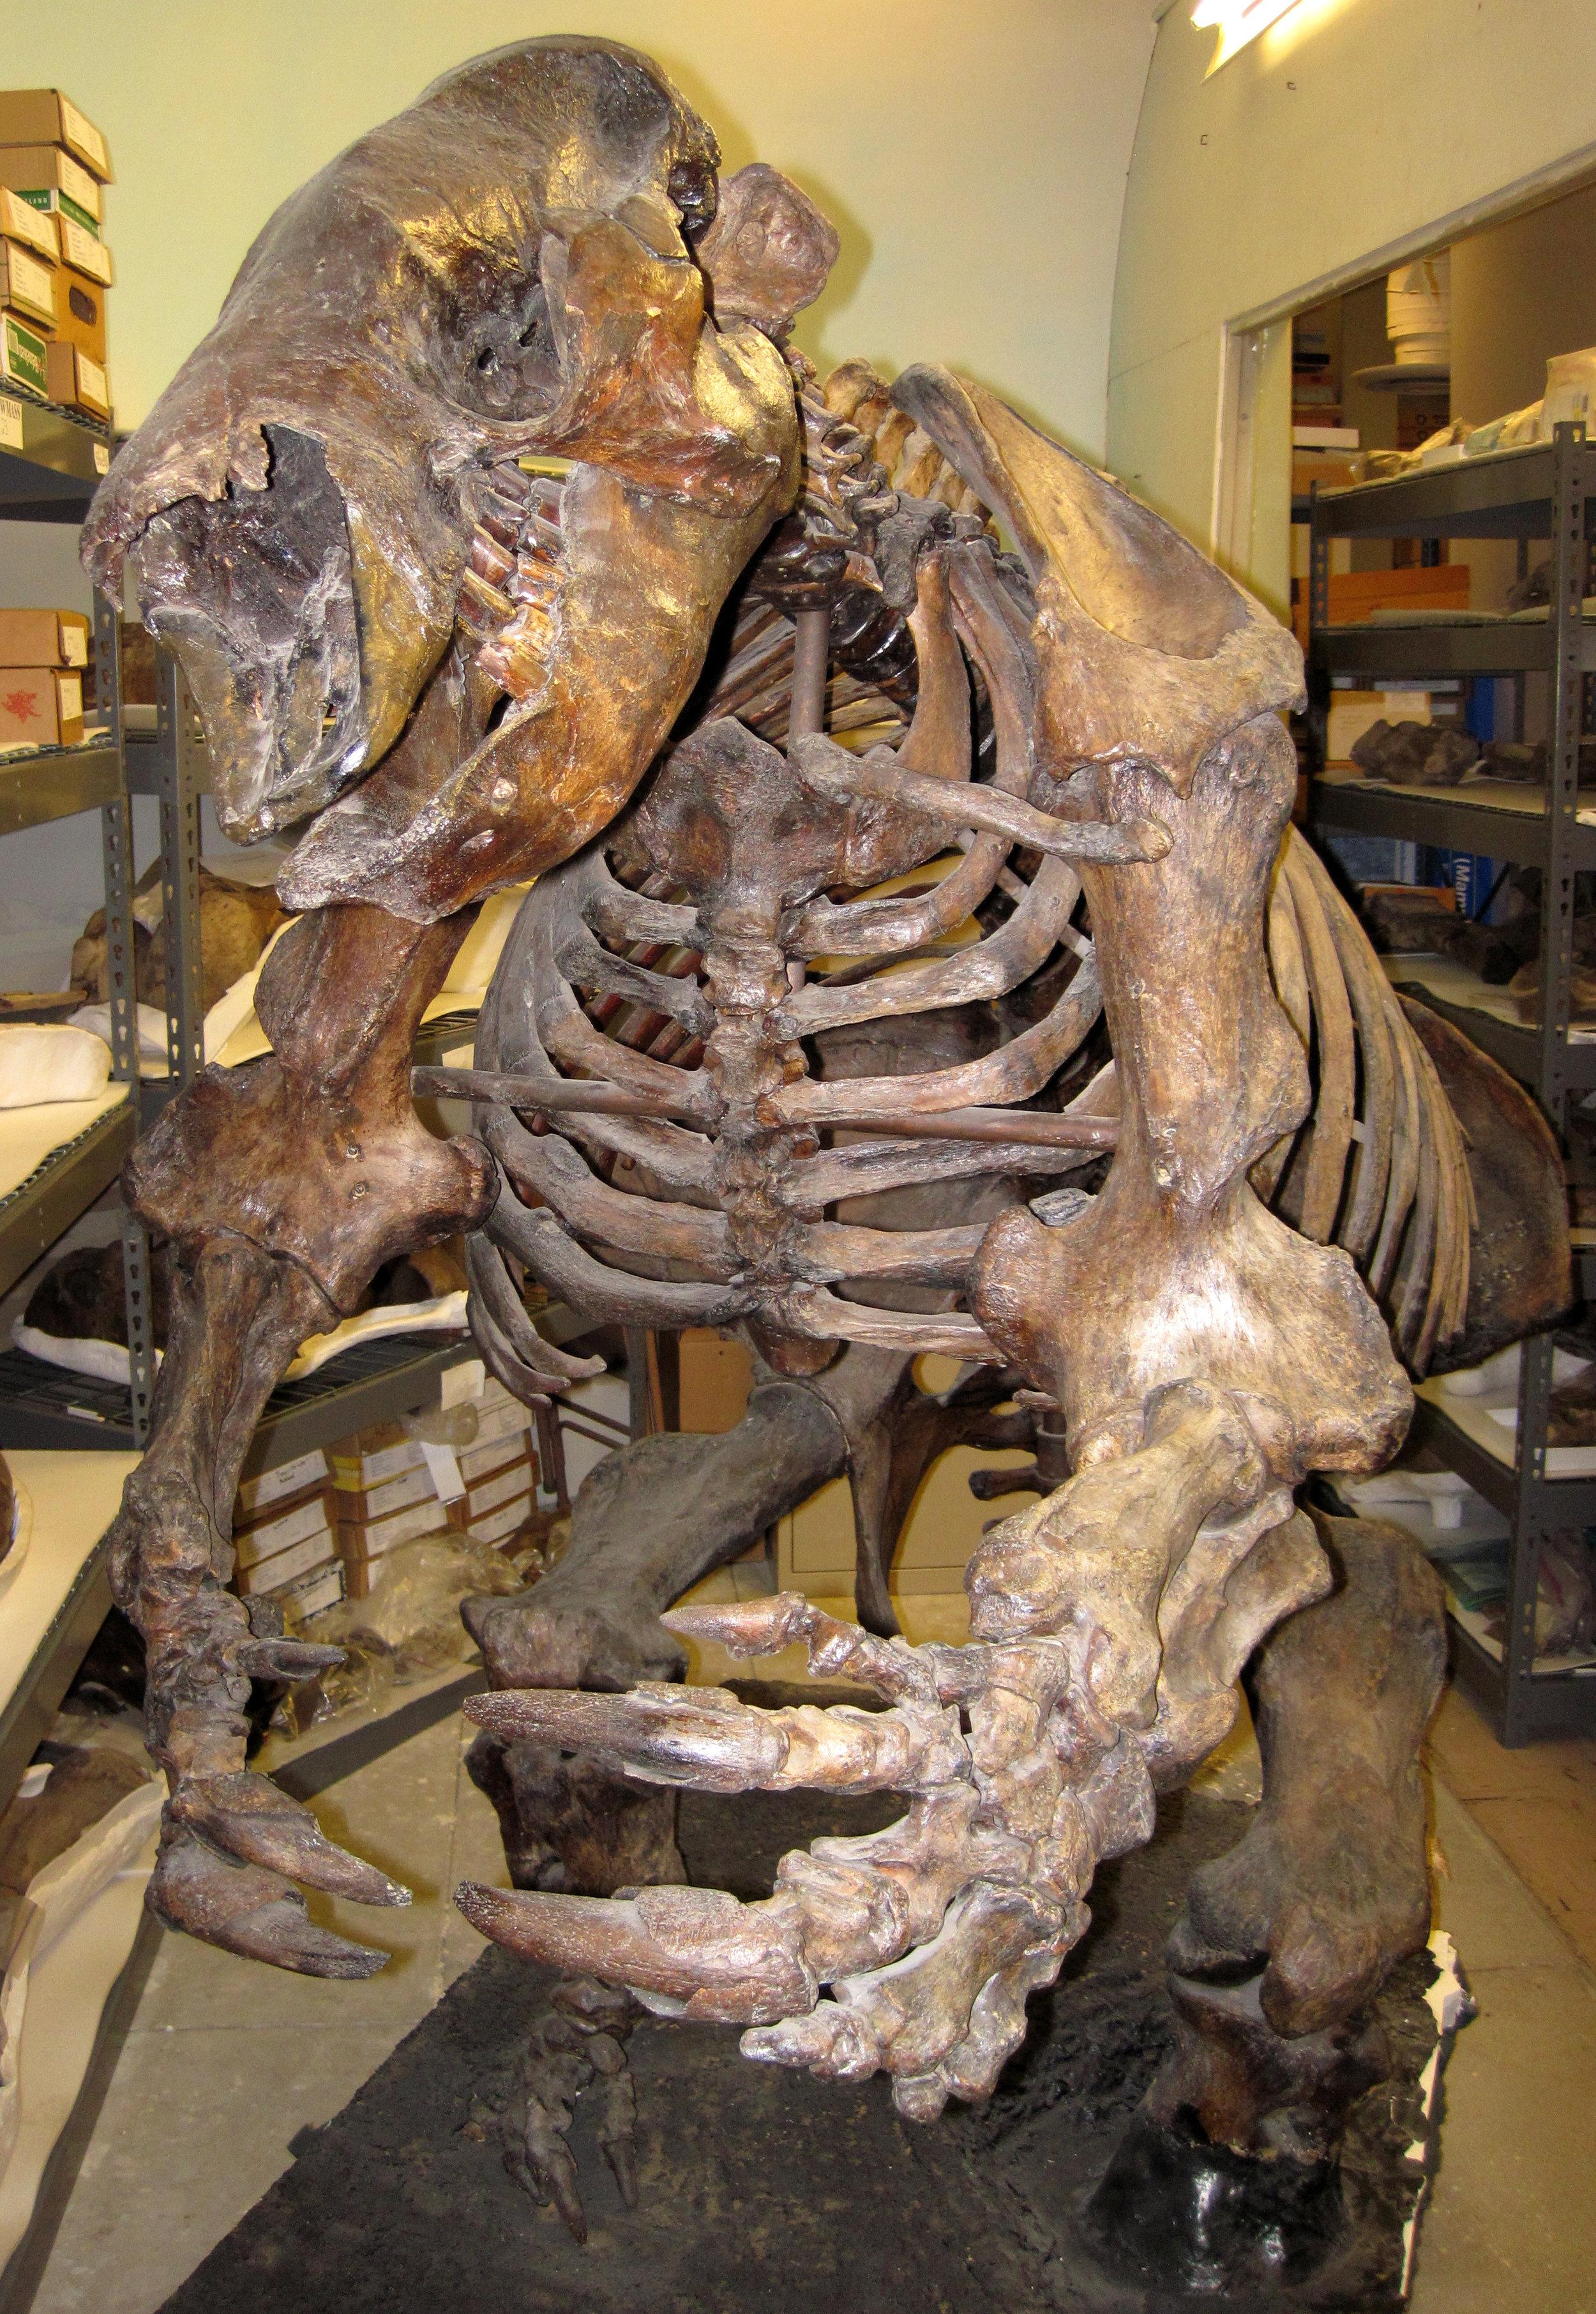 James St. John , Paramylodon harlani ground sloth (La Brea Asphalt, Upper Pleistocene; Rancho La Brea, Los Angeles, southern California, USA) 7 (15444177065) , CC BY 2.0